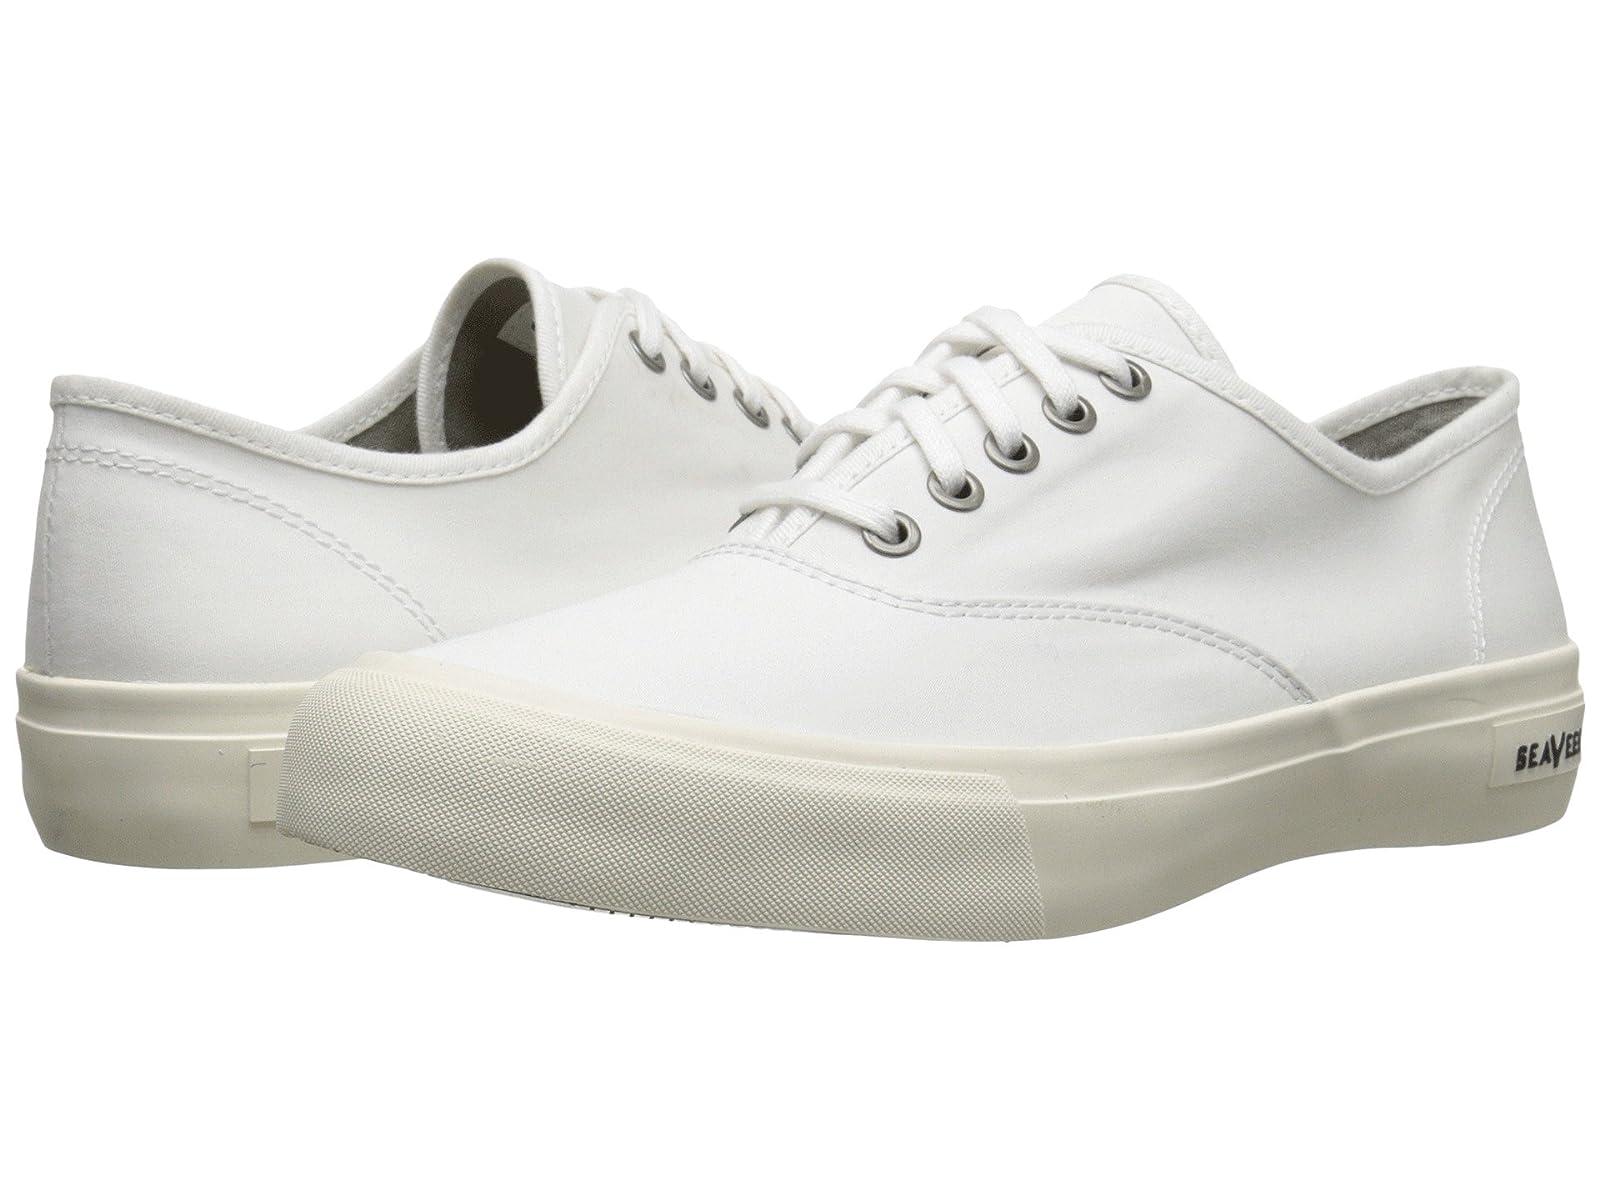 SeaVees 06/64 Legend Sneaker StandardAtmospheric grades have affordable shoes